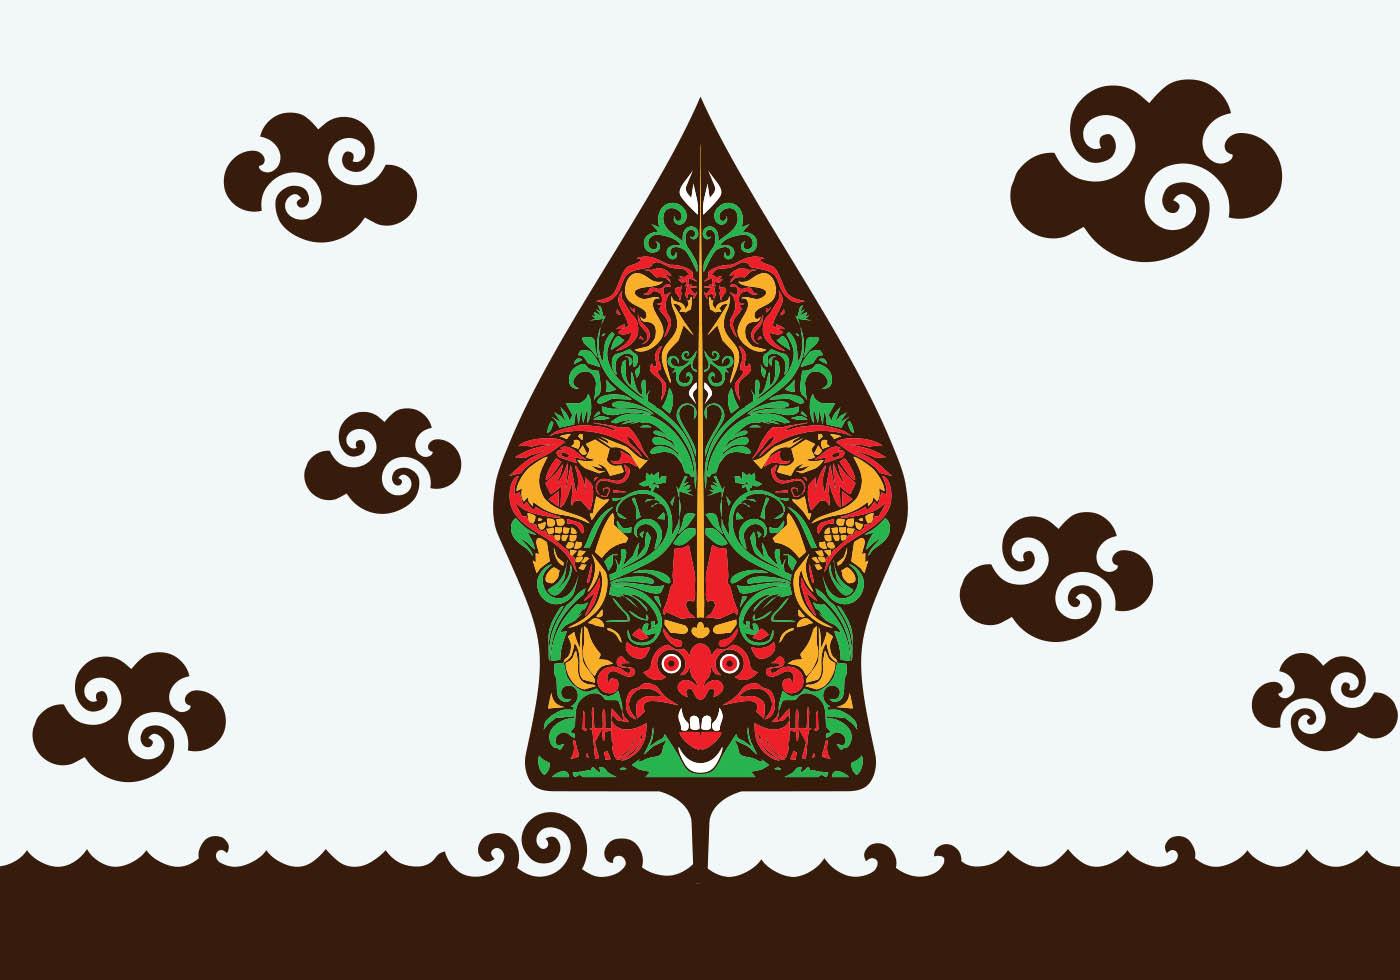 illustration of gunungan wayang download free vectors clipart graphics vector art https www vecteezy com vector art 131397 illustration of gunungan wayang